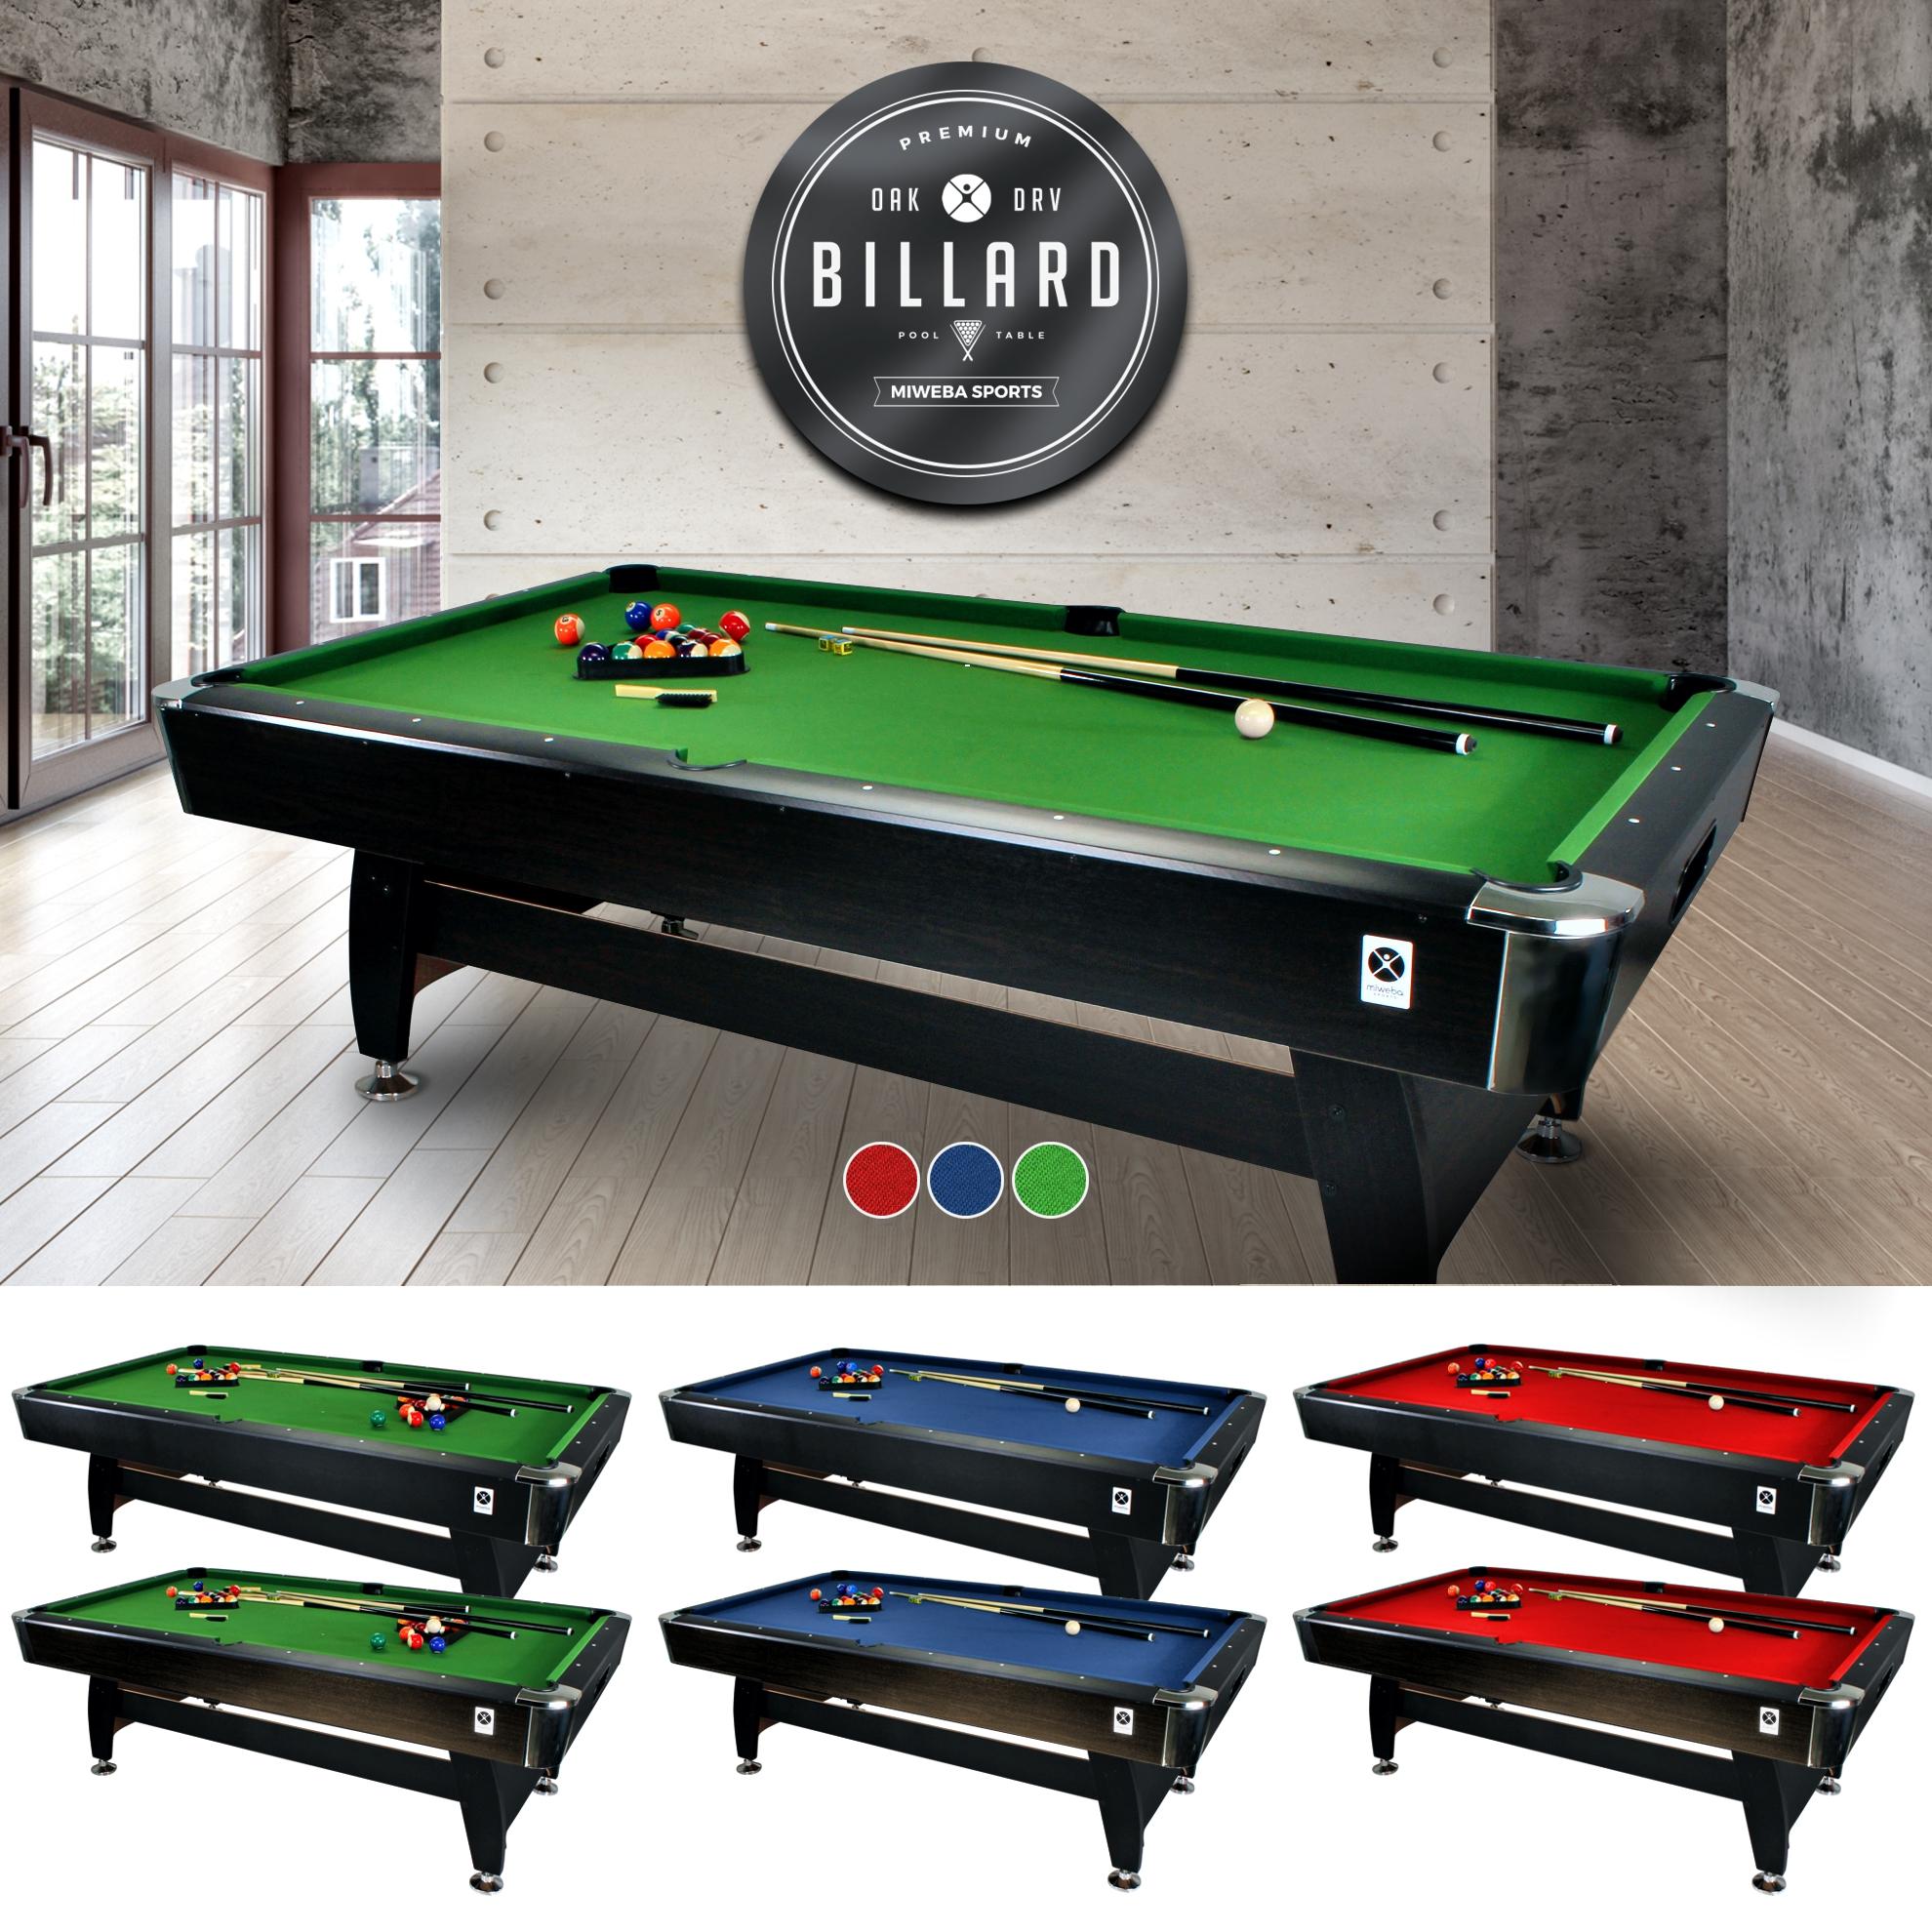 Miweba mesa de billar 7 ft billar billiardtisch billar piscina 7 pie billiard ebay - Mesa billar 8 pies ...